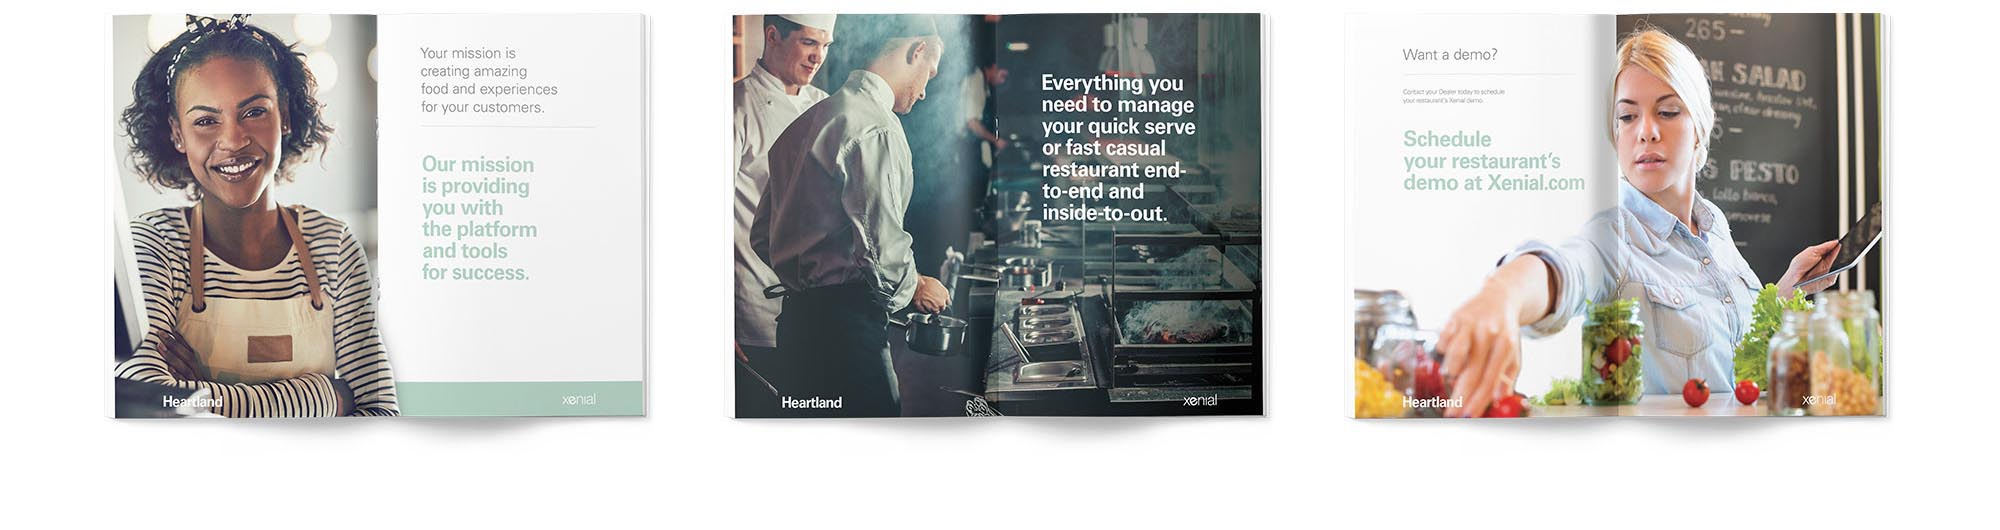 heartland-NRA-brochure-white.jpg